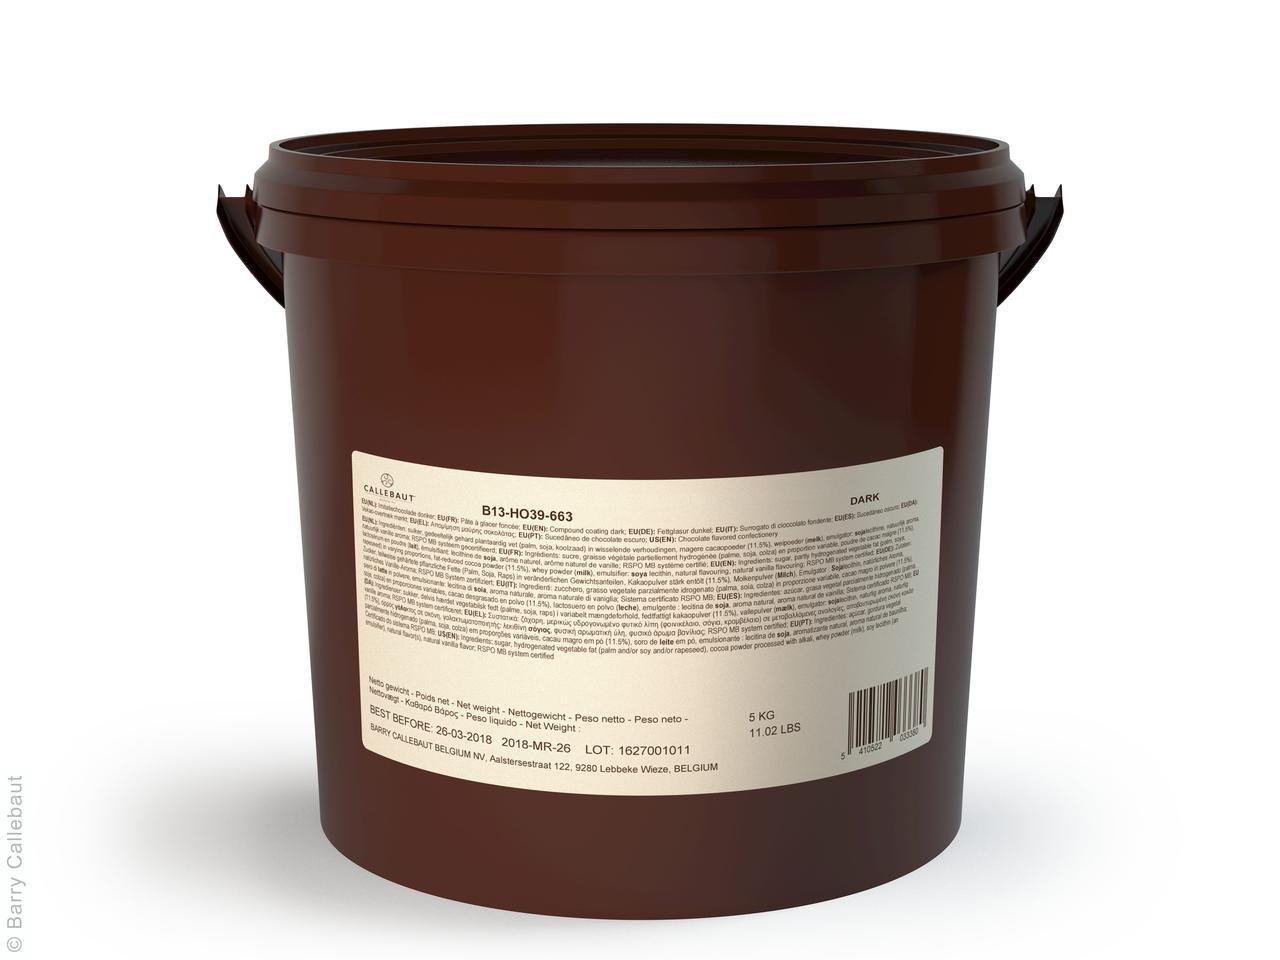 Начинка Creme dellArtigiano Noccialo, Callebaut